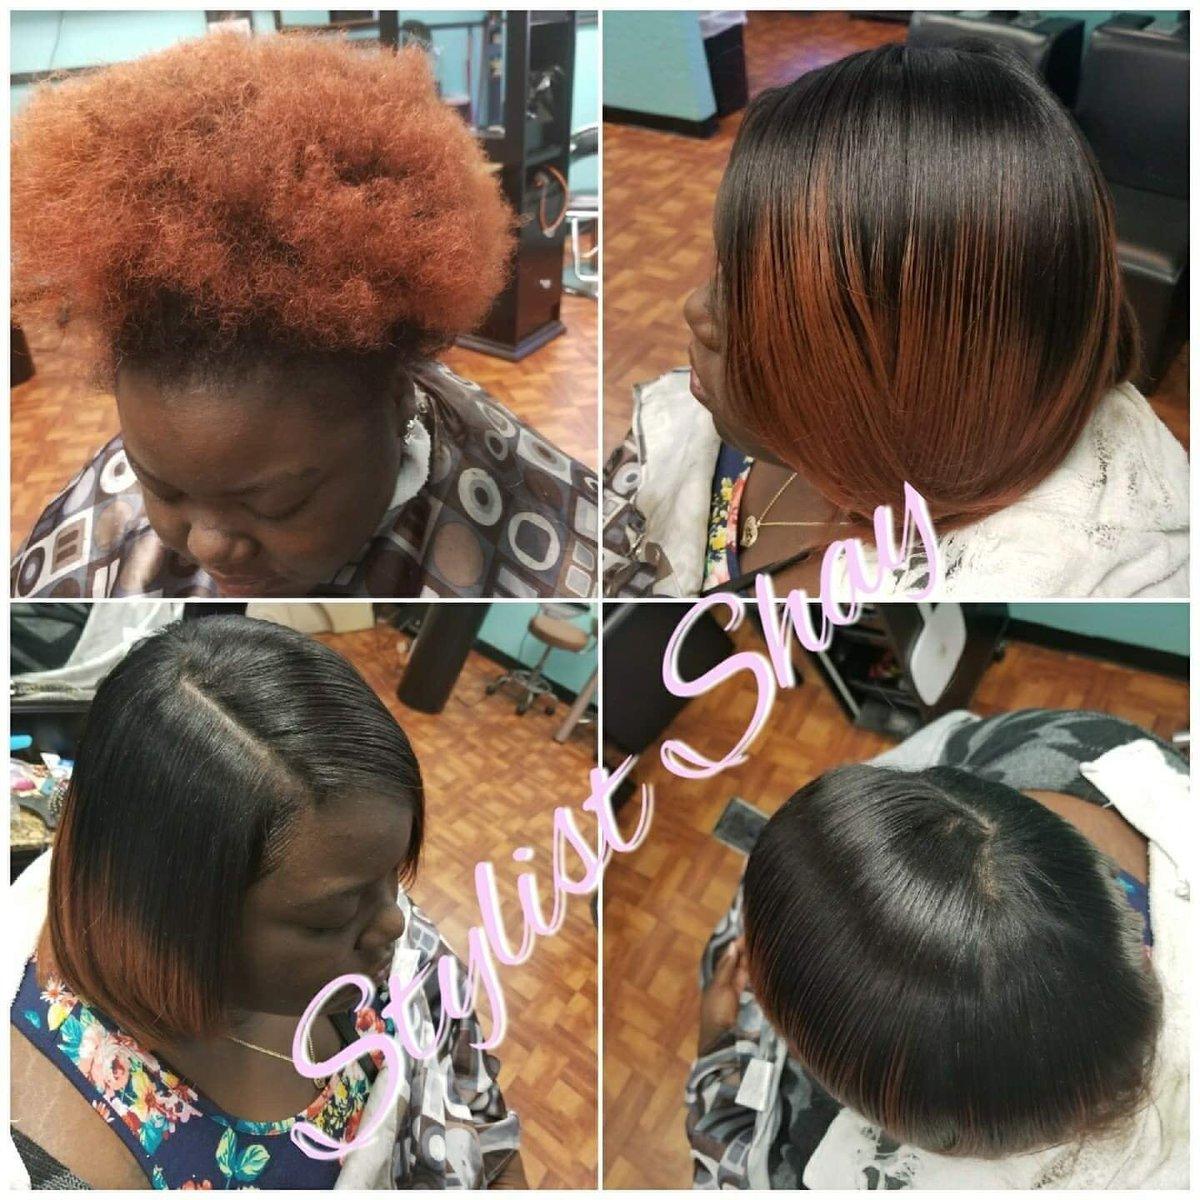 Stylist Shay Healthy Hair Specialist Stylistshay Twitter